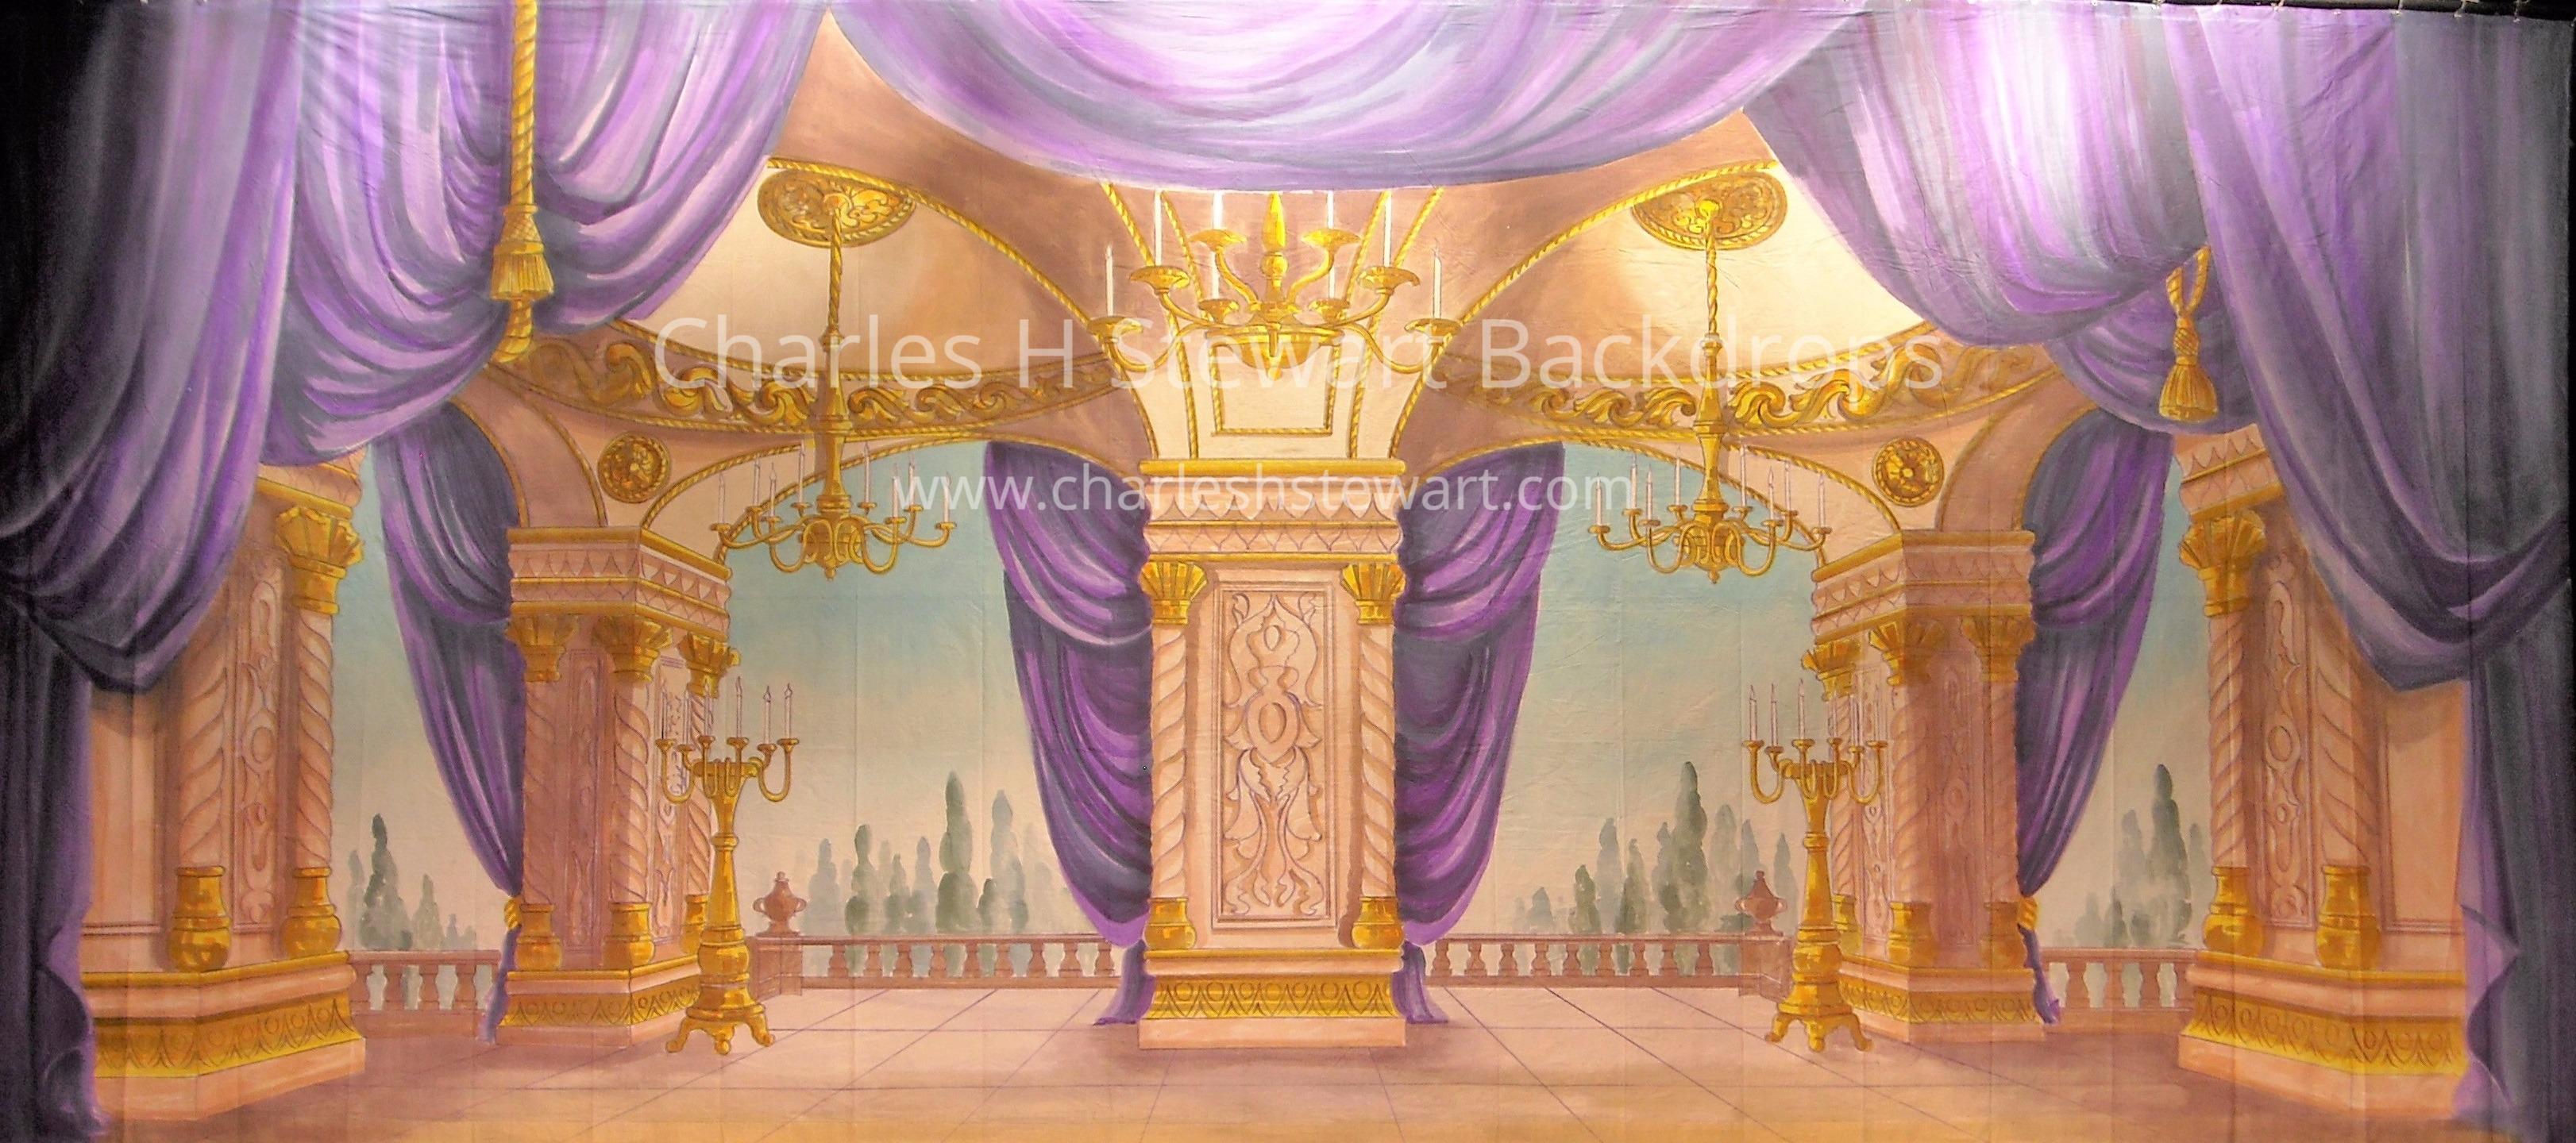 Palace Interior Backdrop - Backdrops by Charles H. Stewart